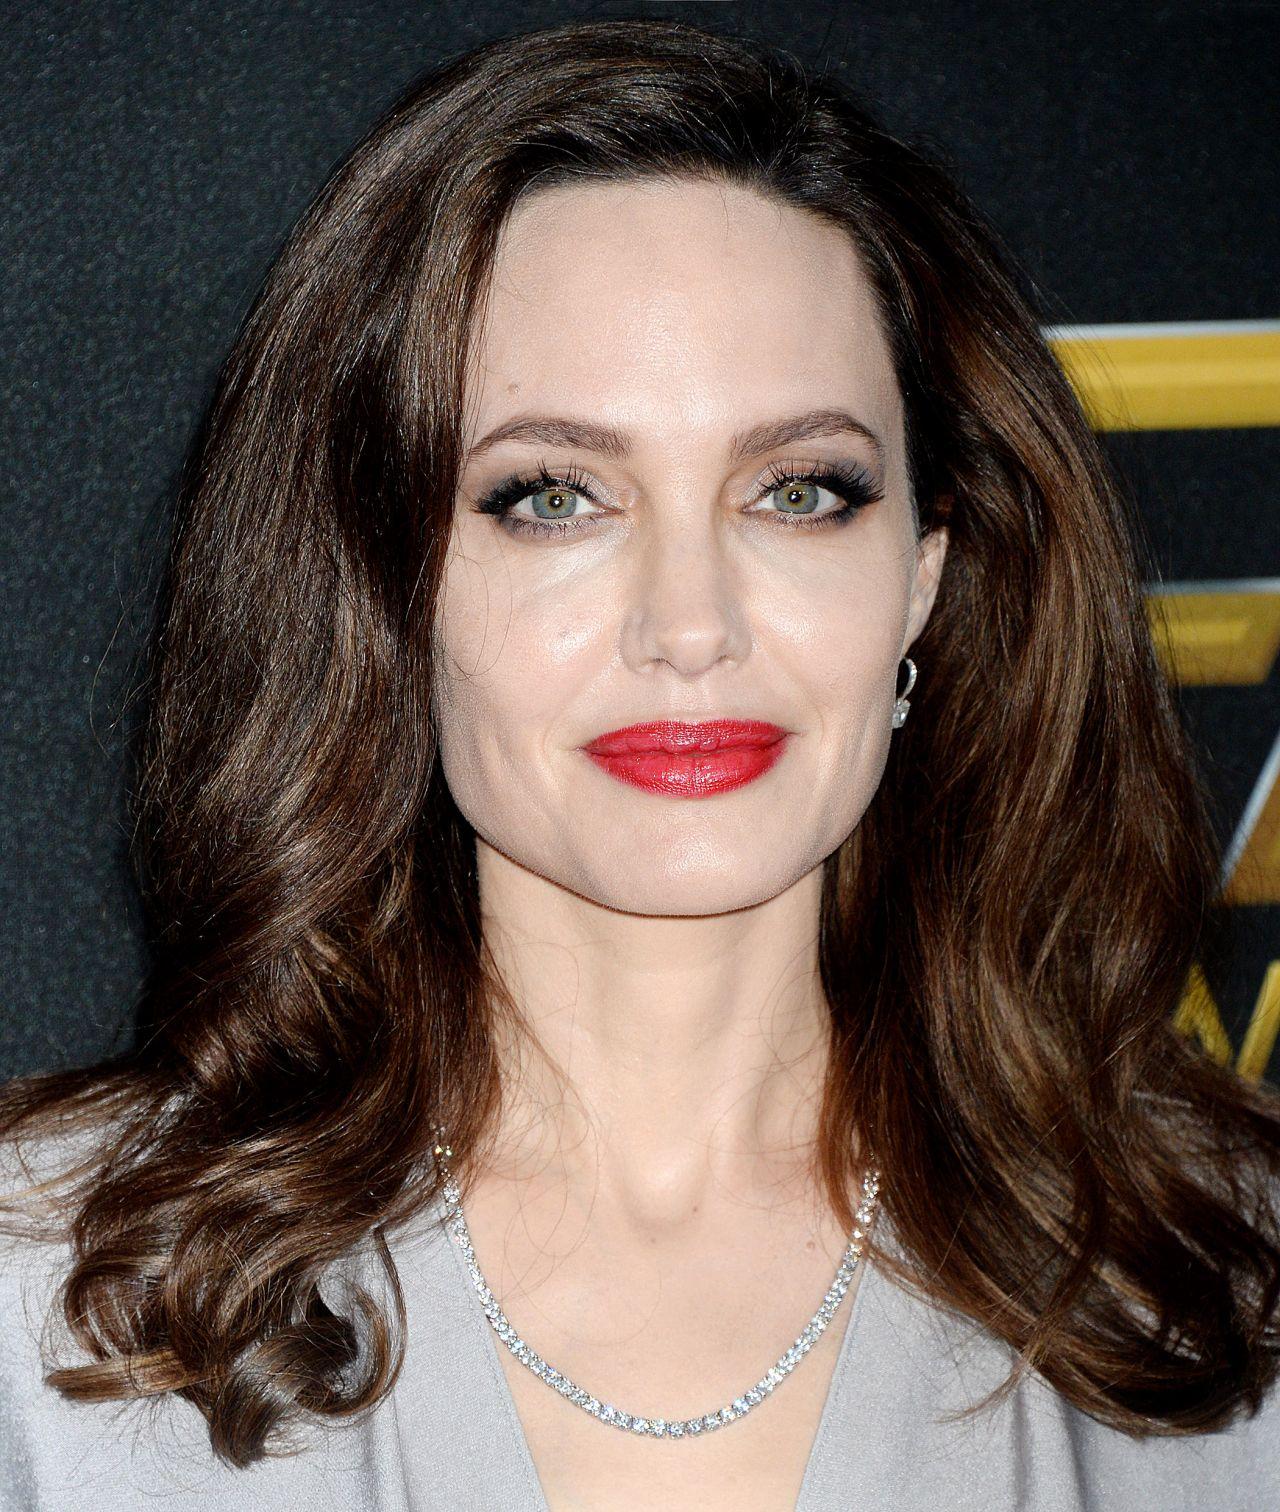 Angelina Jolie – Hollywood Film Awards 2017 in Los Angeles Angelina Jolie